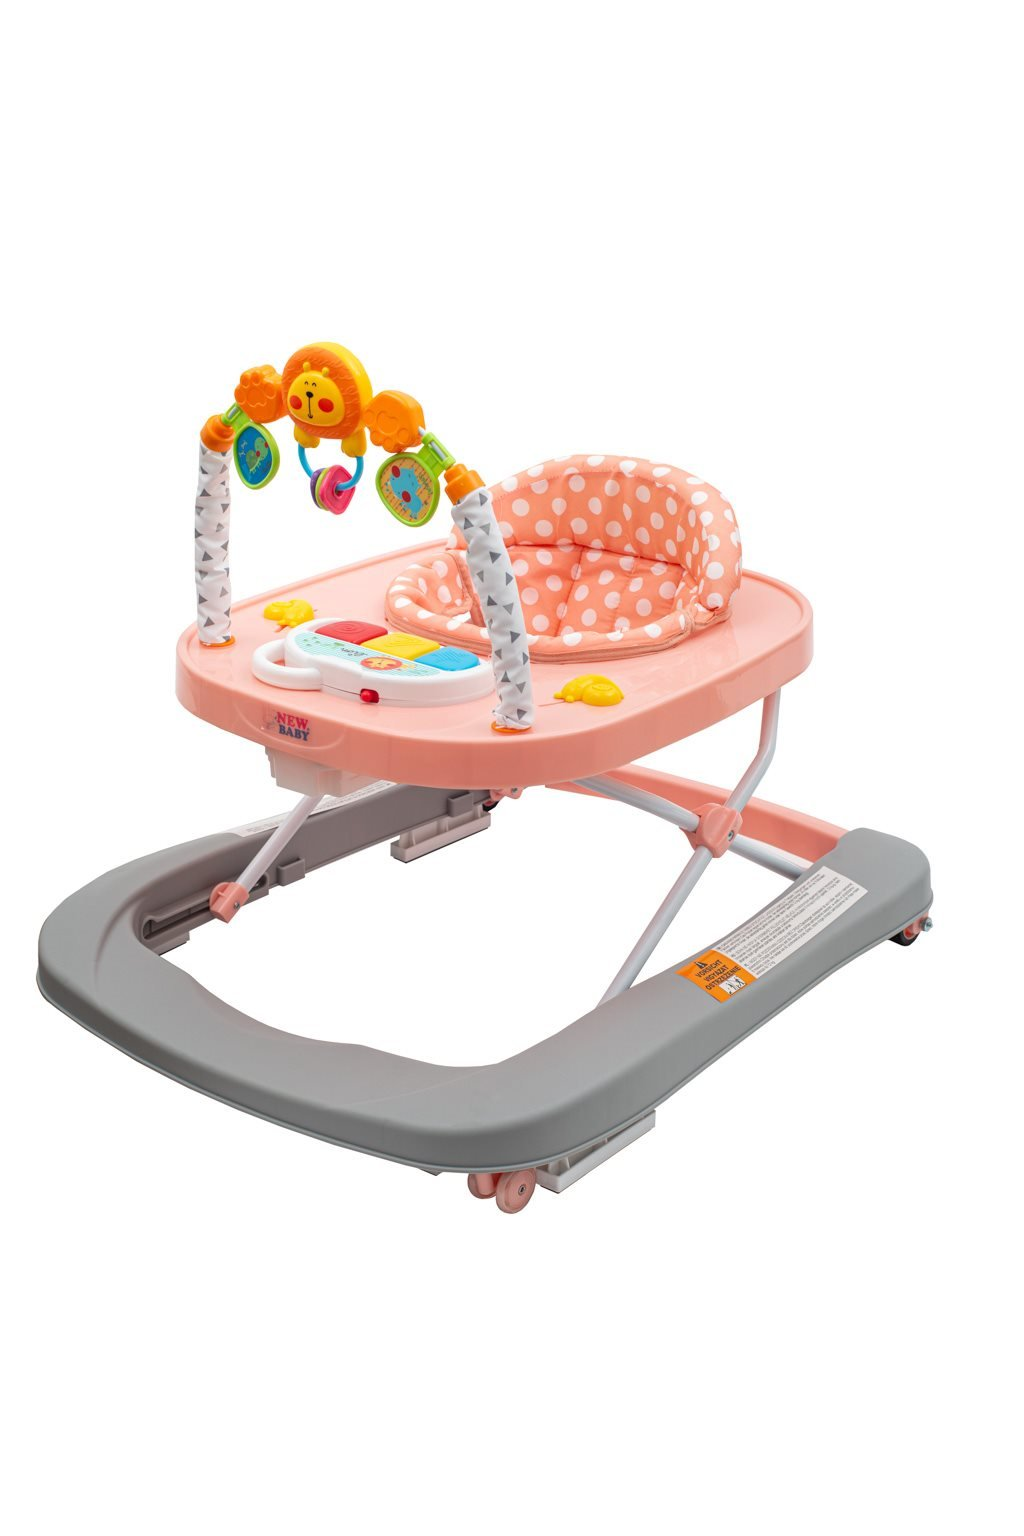 Detské chodítko so silikónovými kolieskami New Baby Forest Kingdom Pink